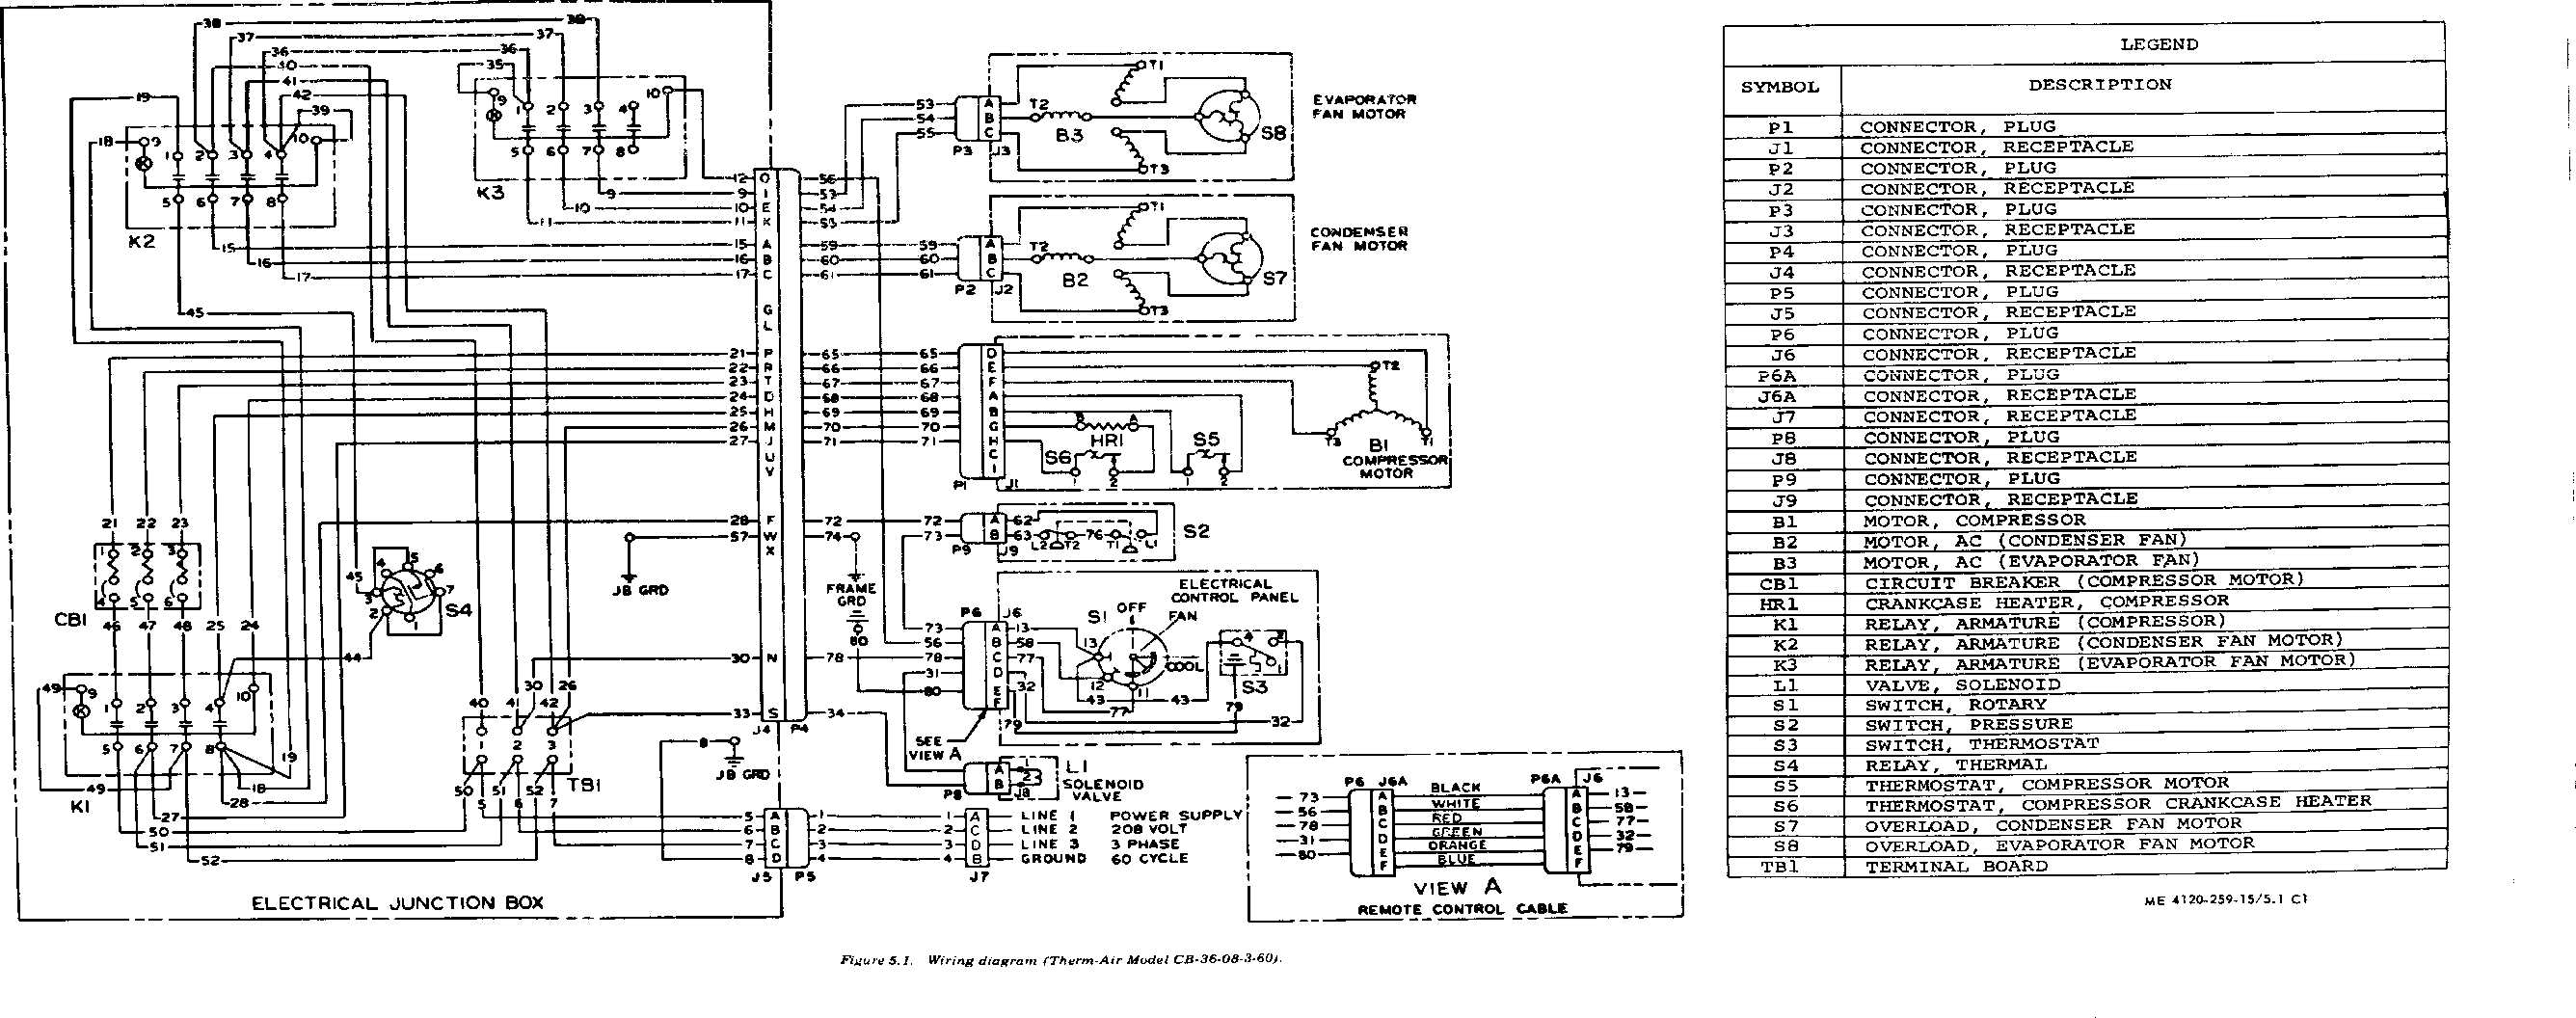 trane ycd 060 wiring diagram. Black Bedroom Furniture Sets. Home Design Ideas